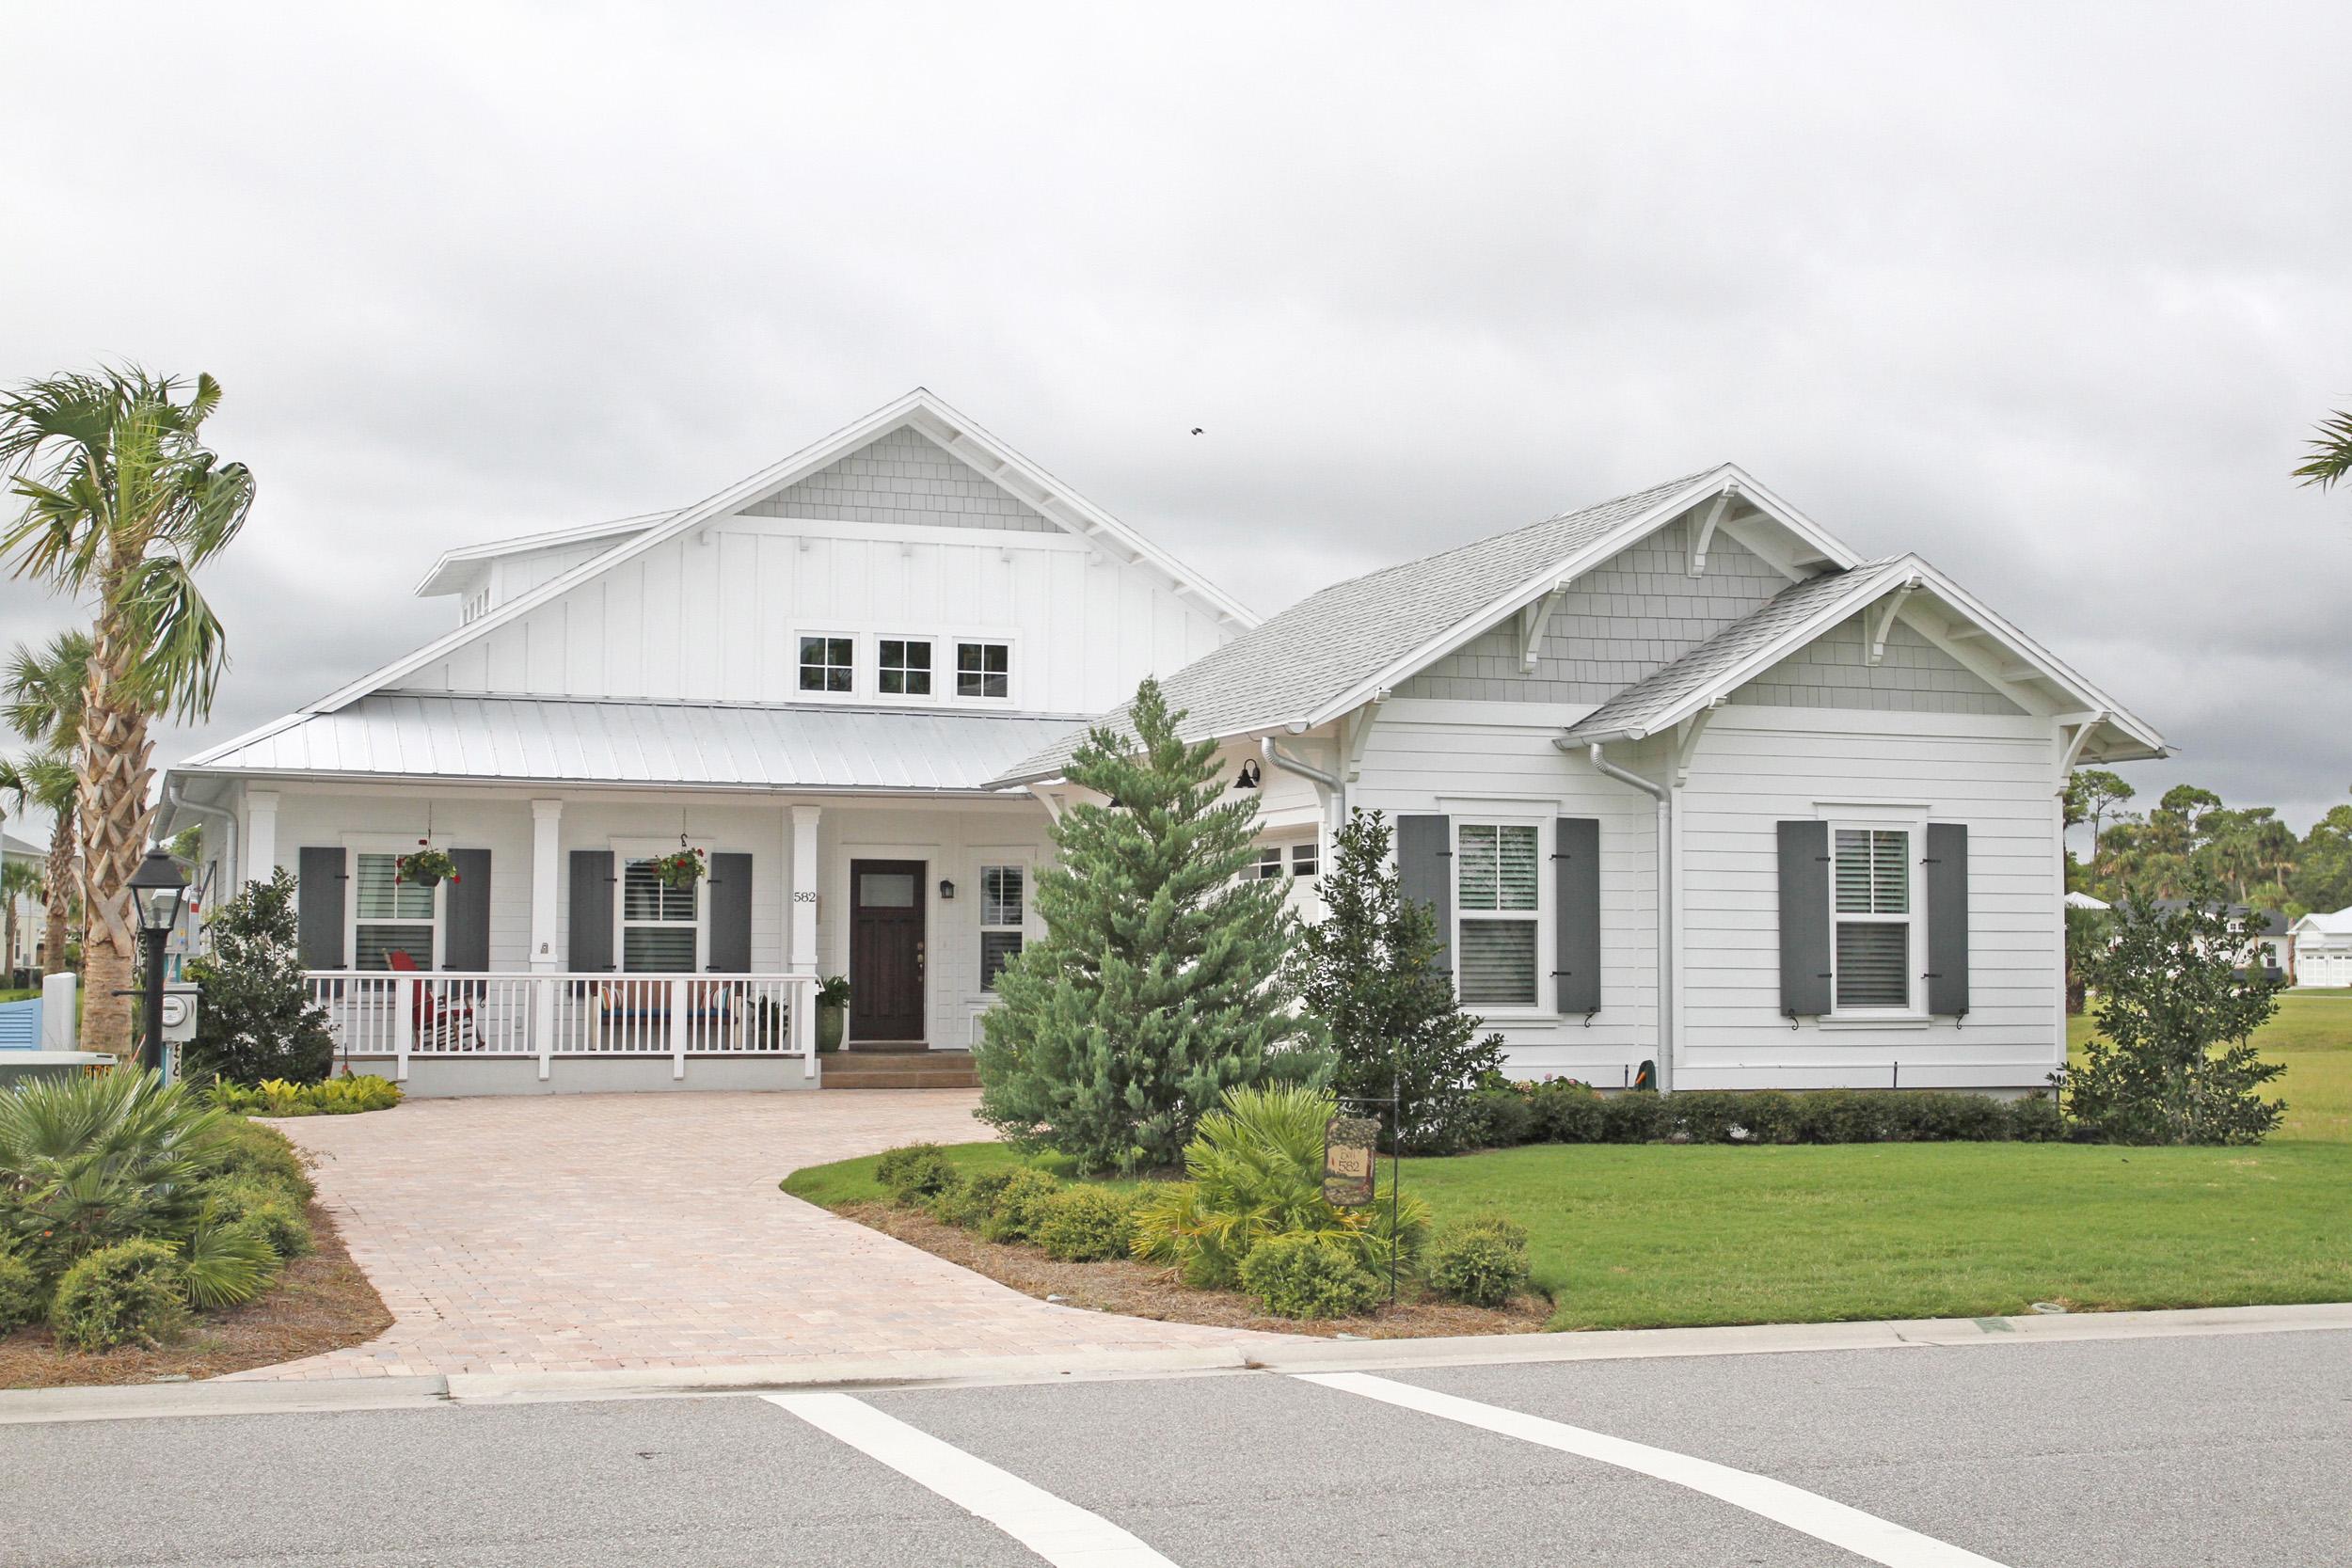 todd bosco home builder, certified general contractor, jax beaches general contractor, custom homes atlantic beach